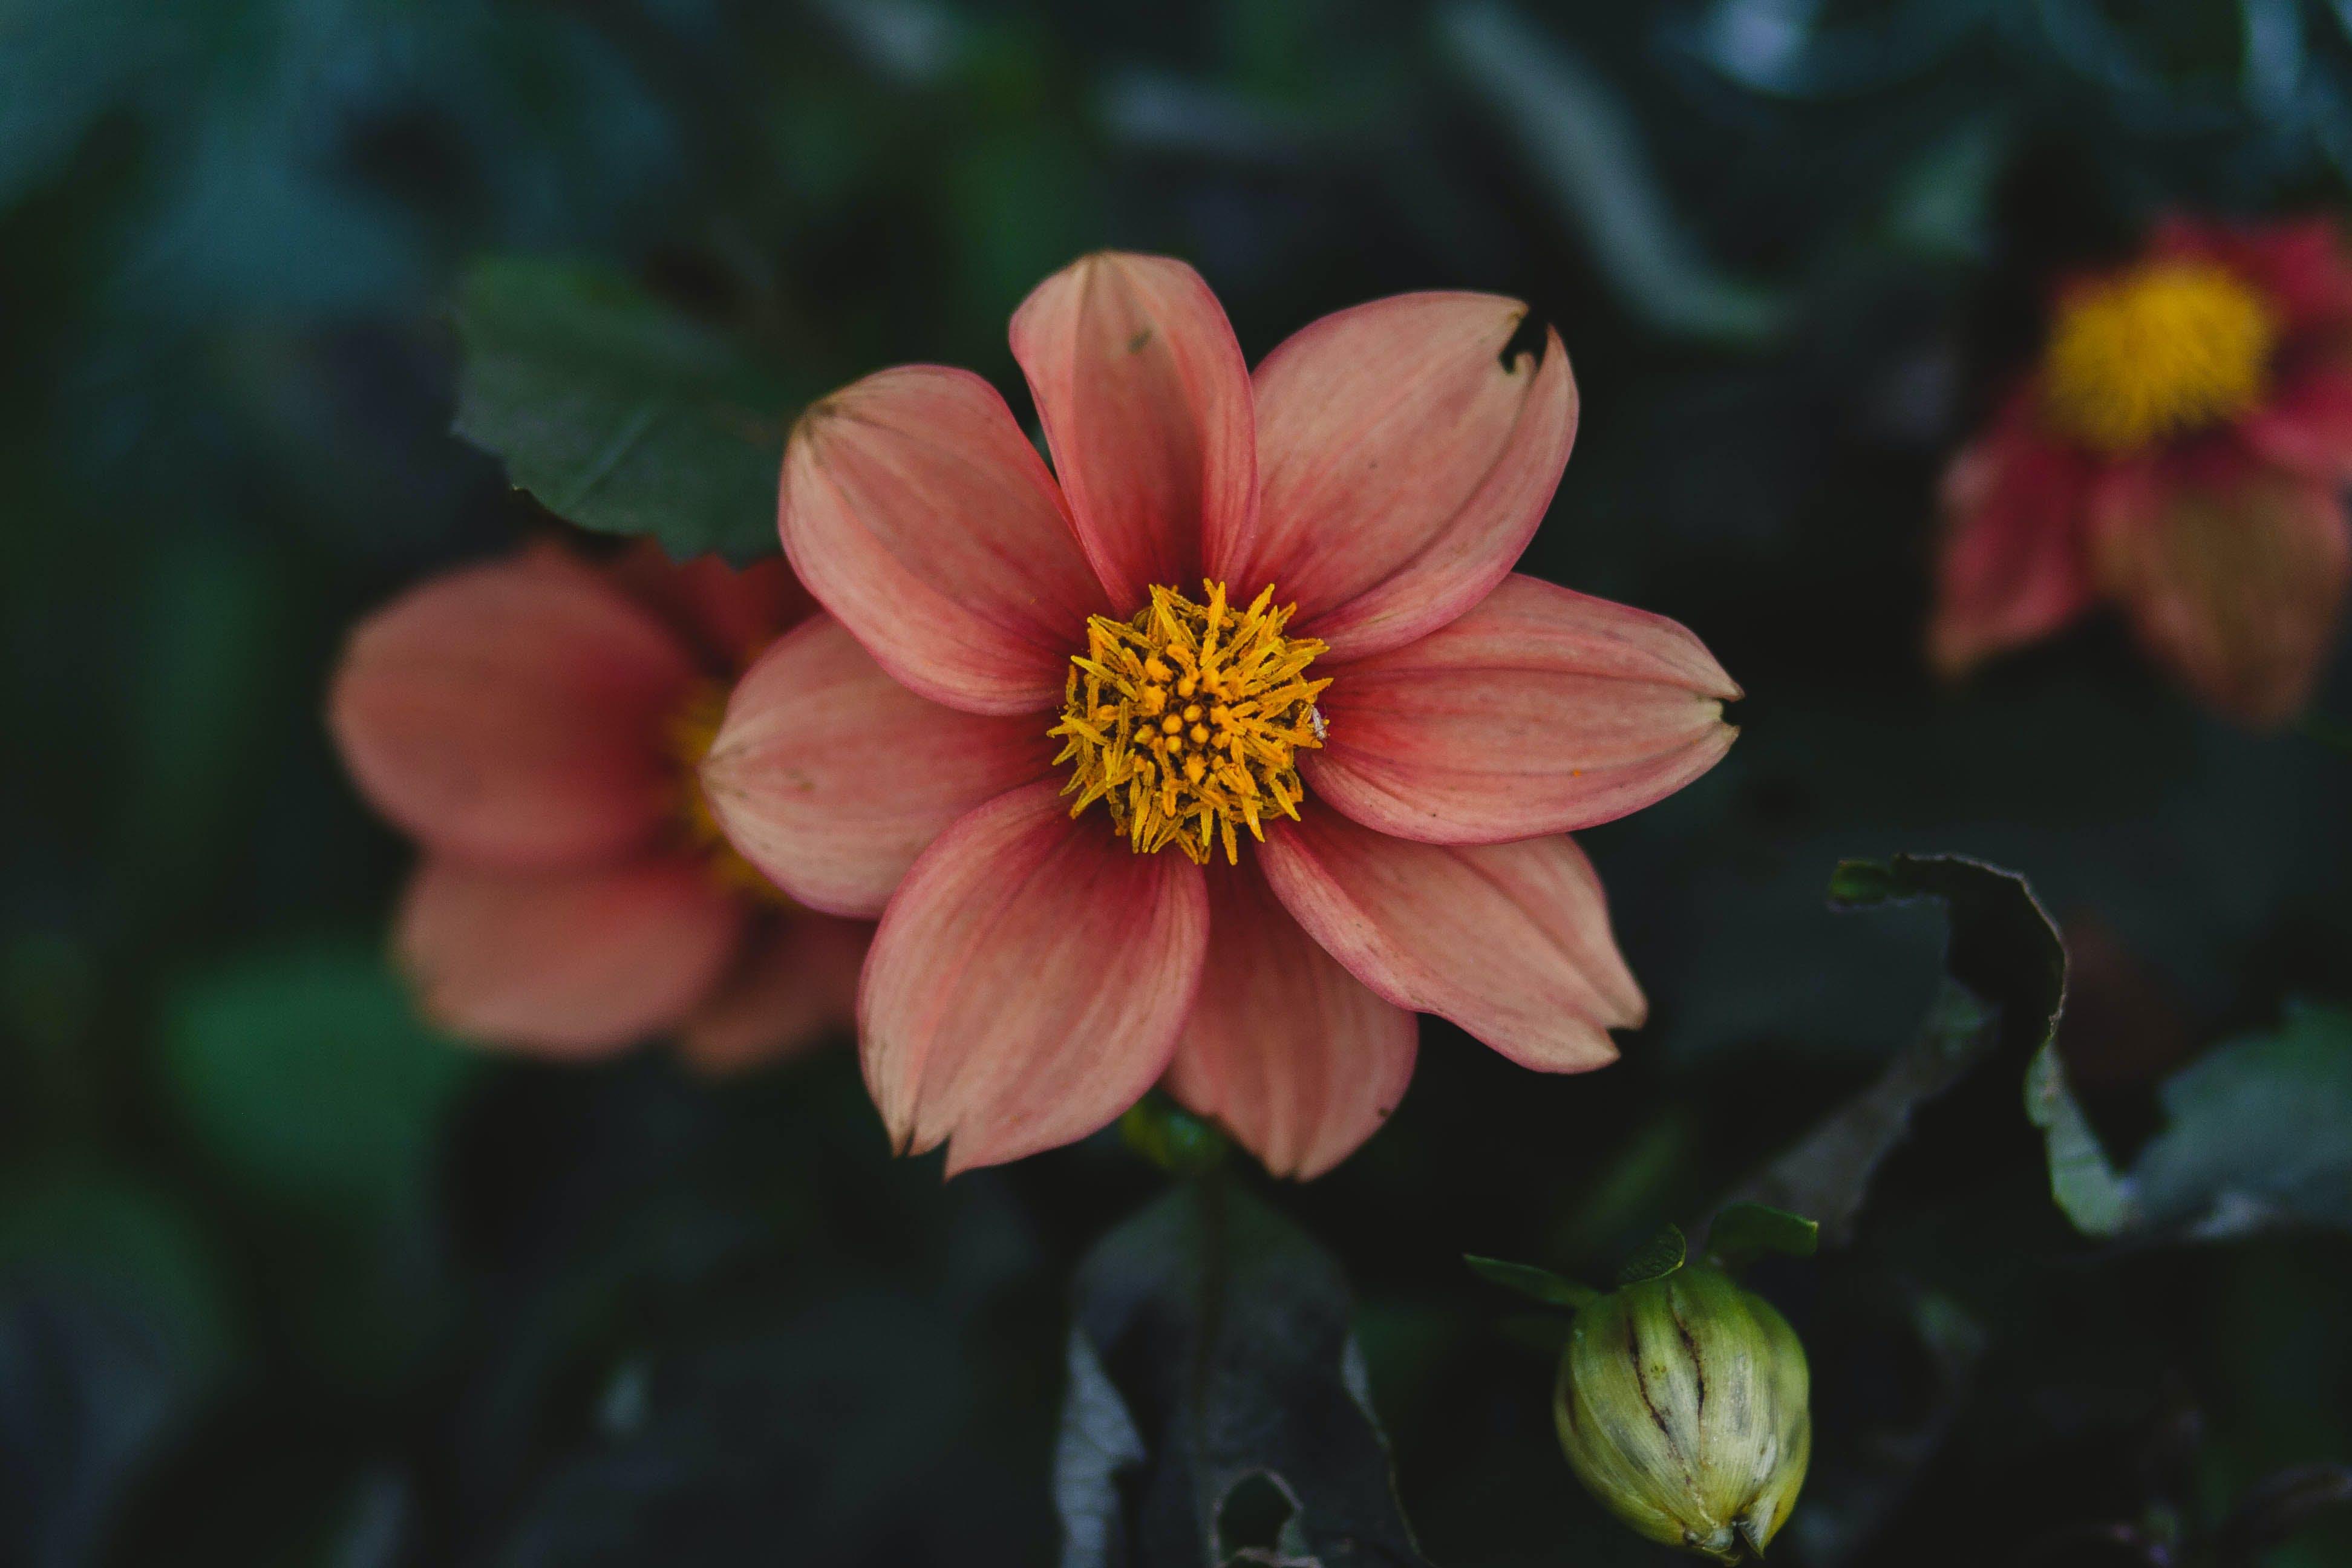 Kostnadsfri bild av blommor, blomning, botanisk, delikat